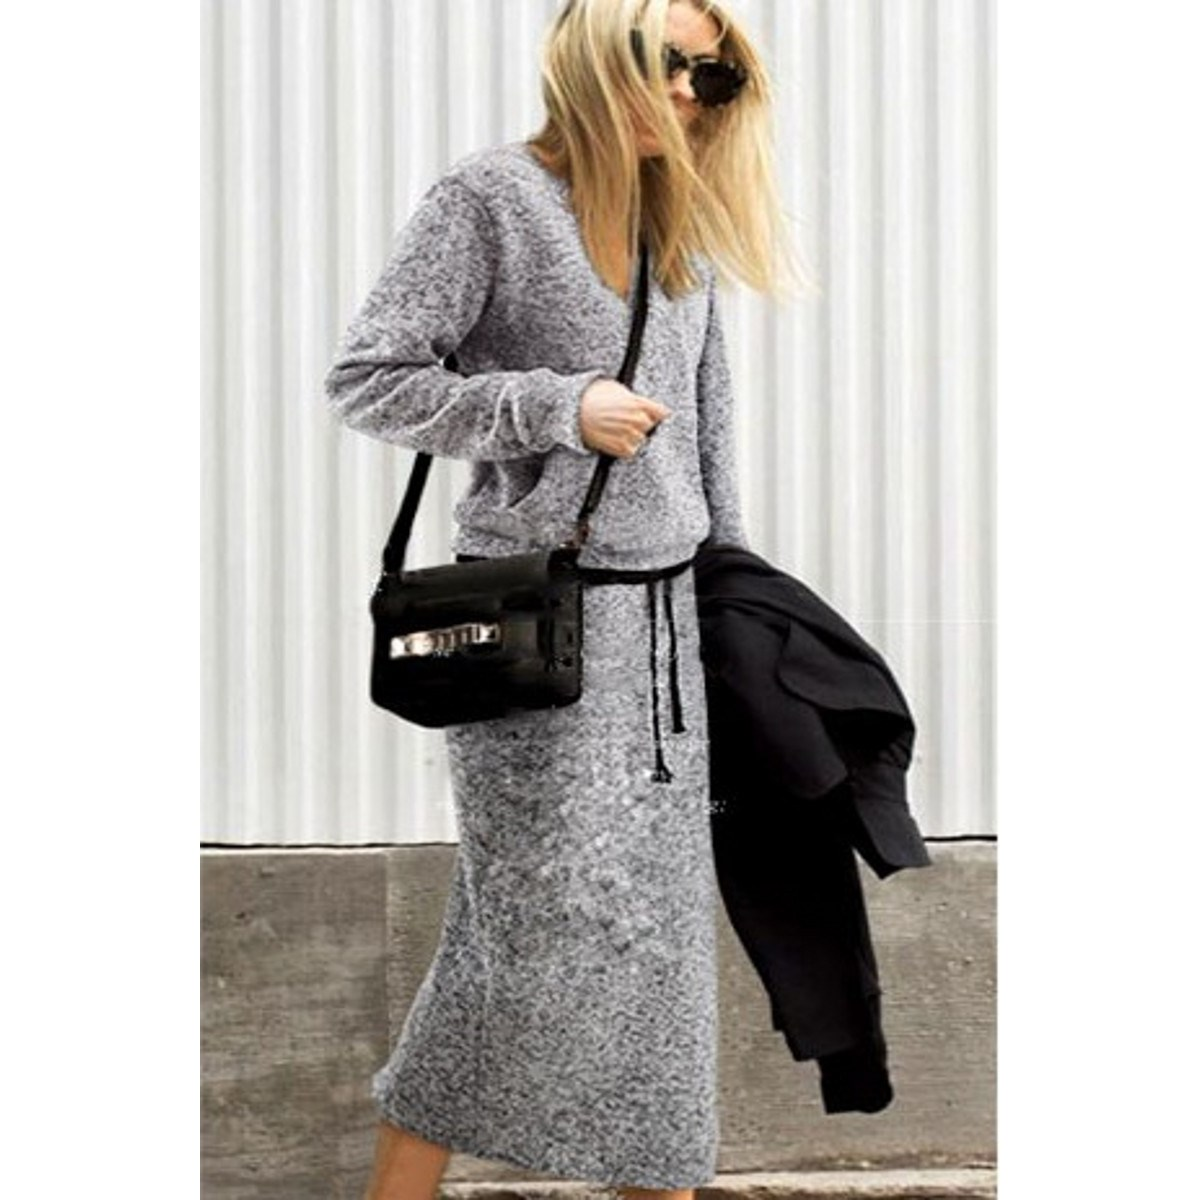 331a44c2ce7f New Autumn Women Knit Sweatshirt Skirt Set Long Sleeve Sweaters Top ...